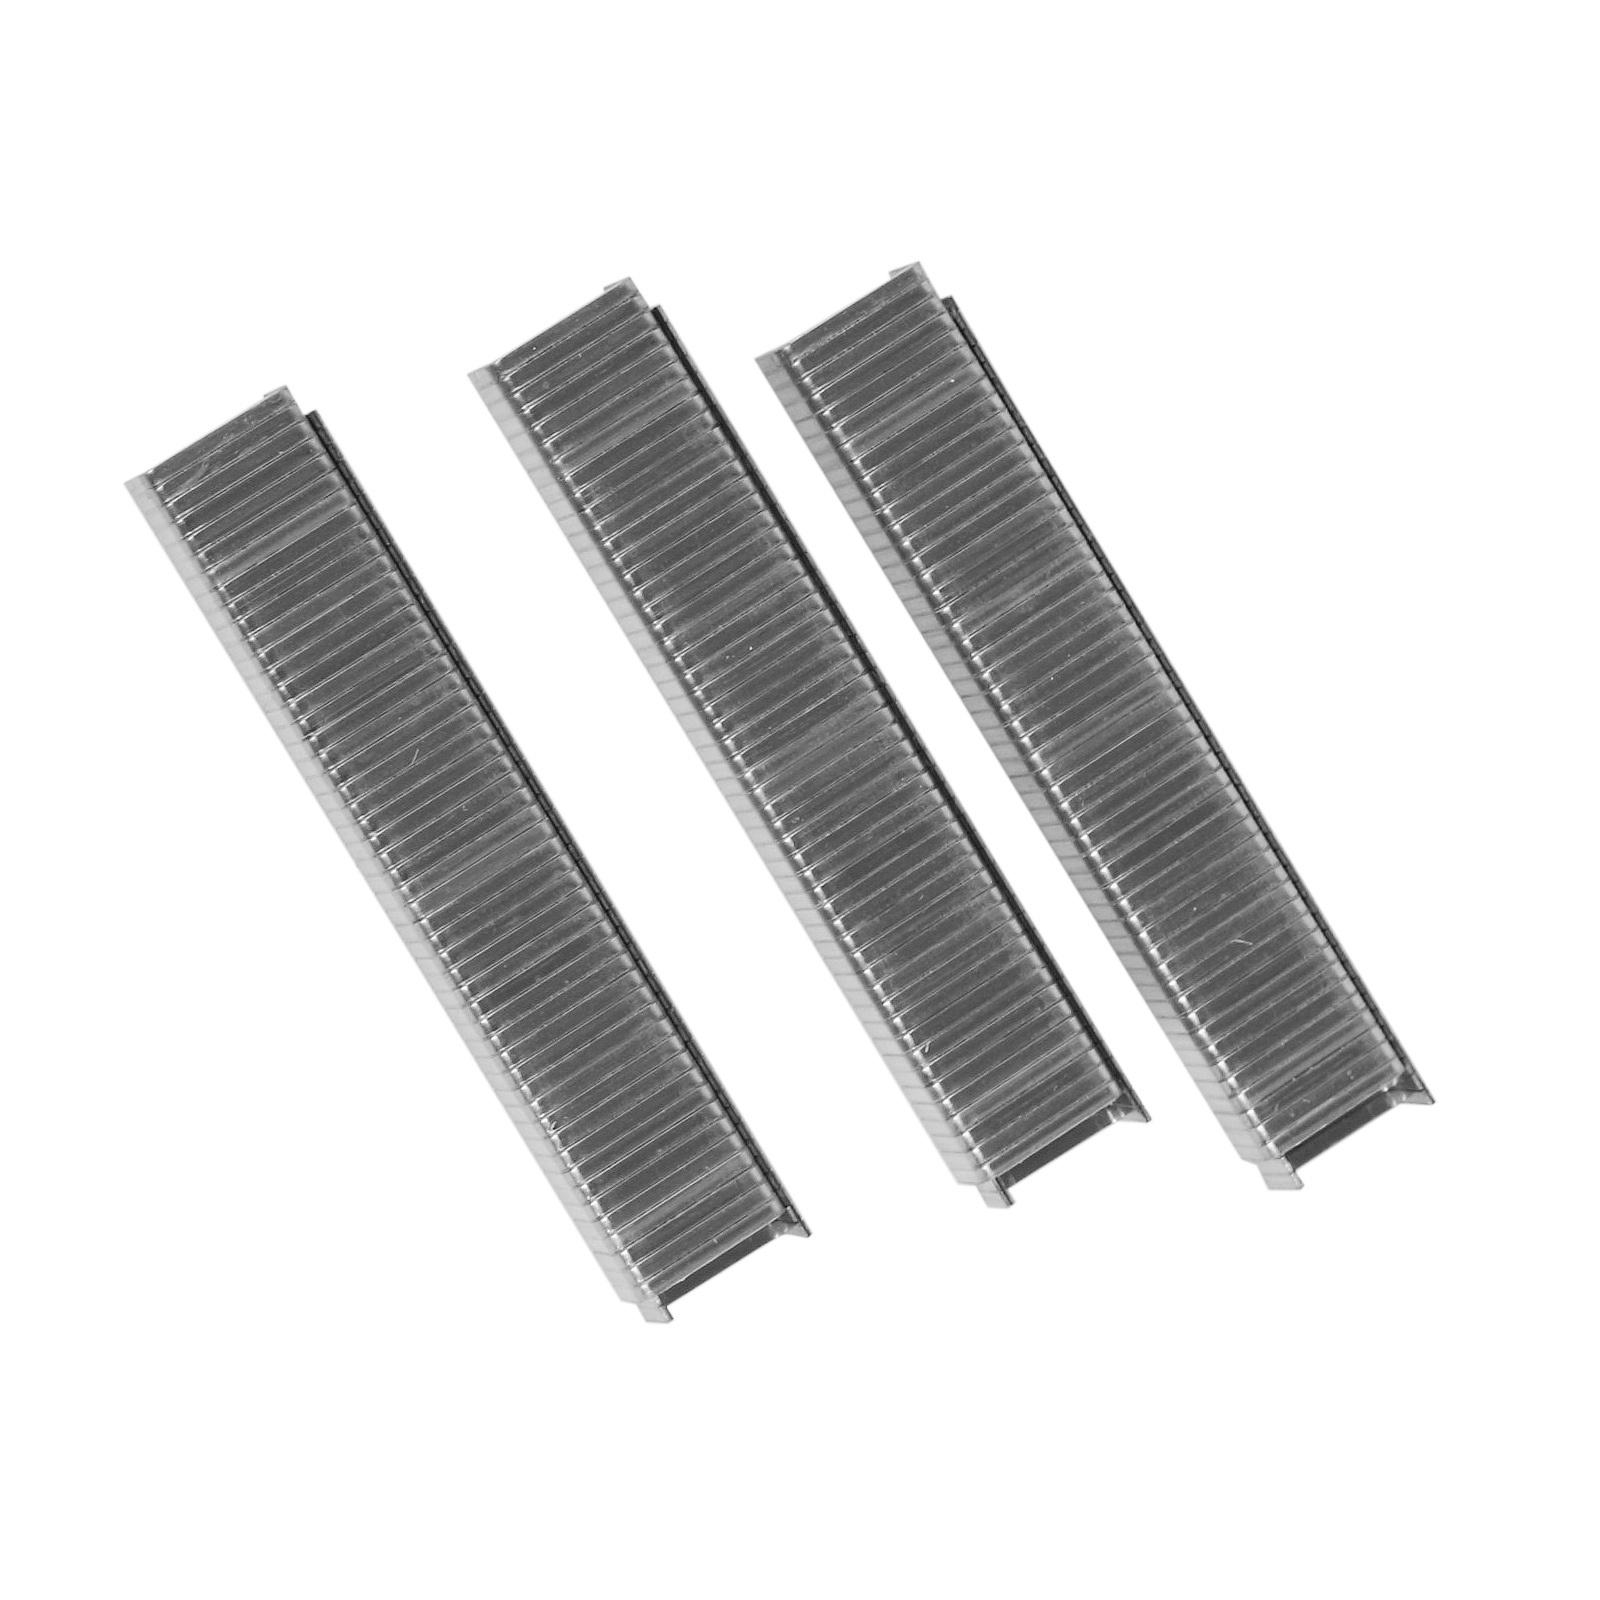 China 12mm Heavy Duty Nails U Shaped Galvanized Staples - China Staples, Nails